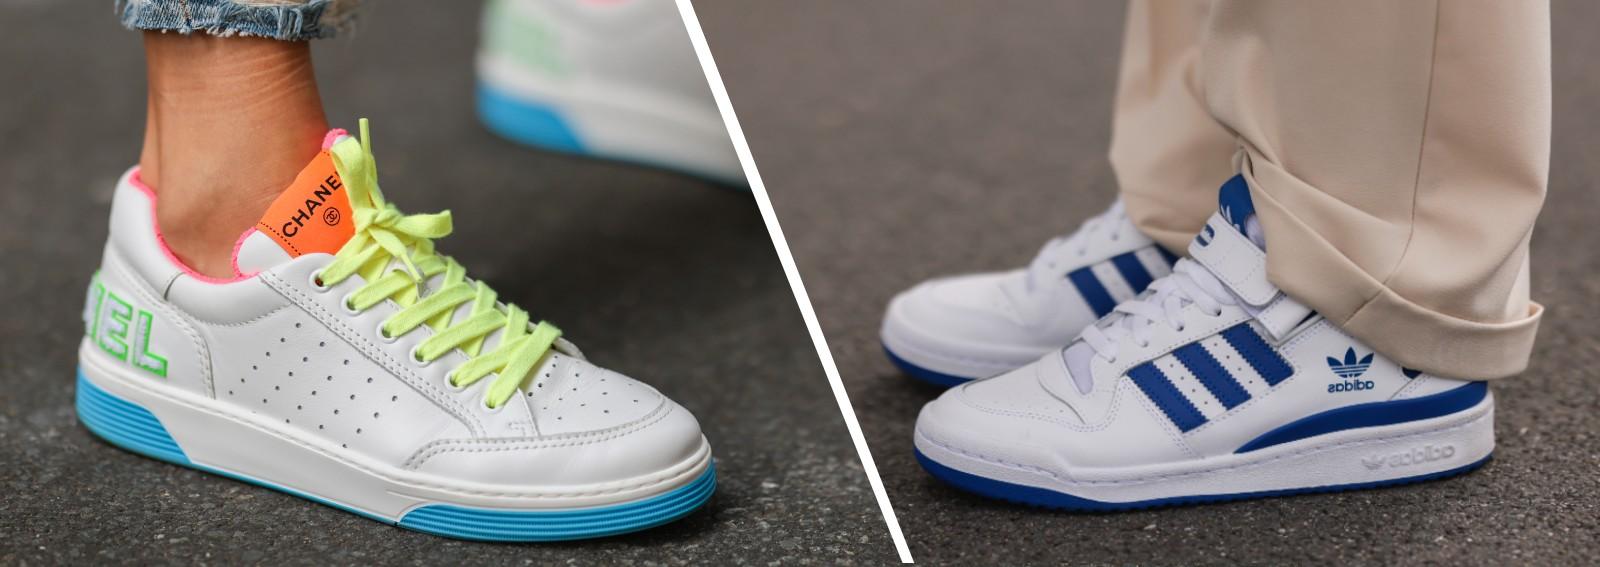 sneakers DESK